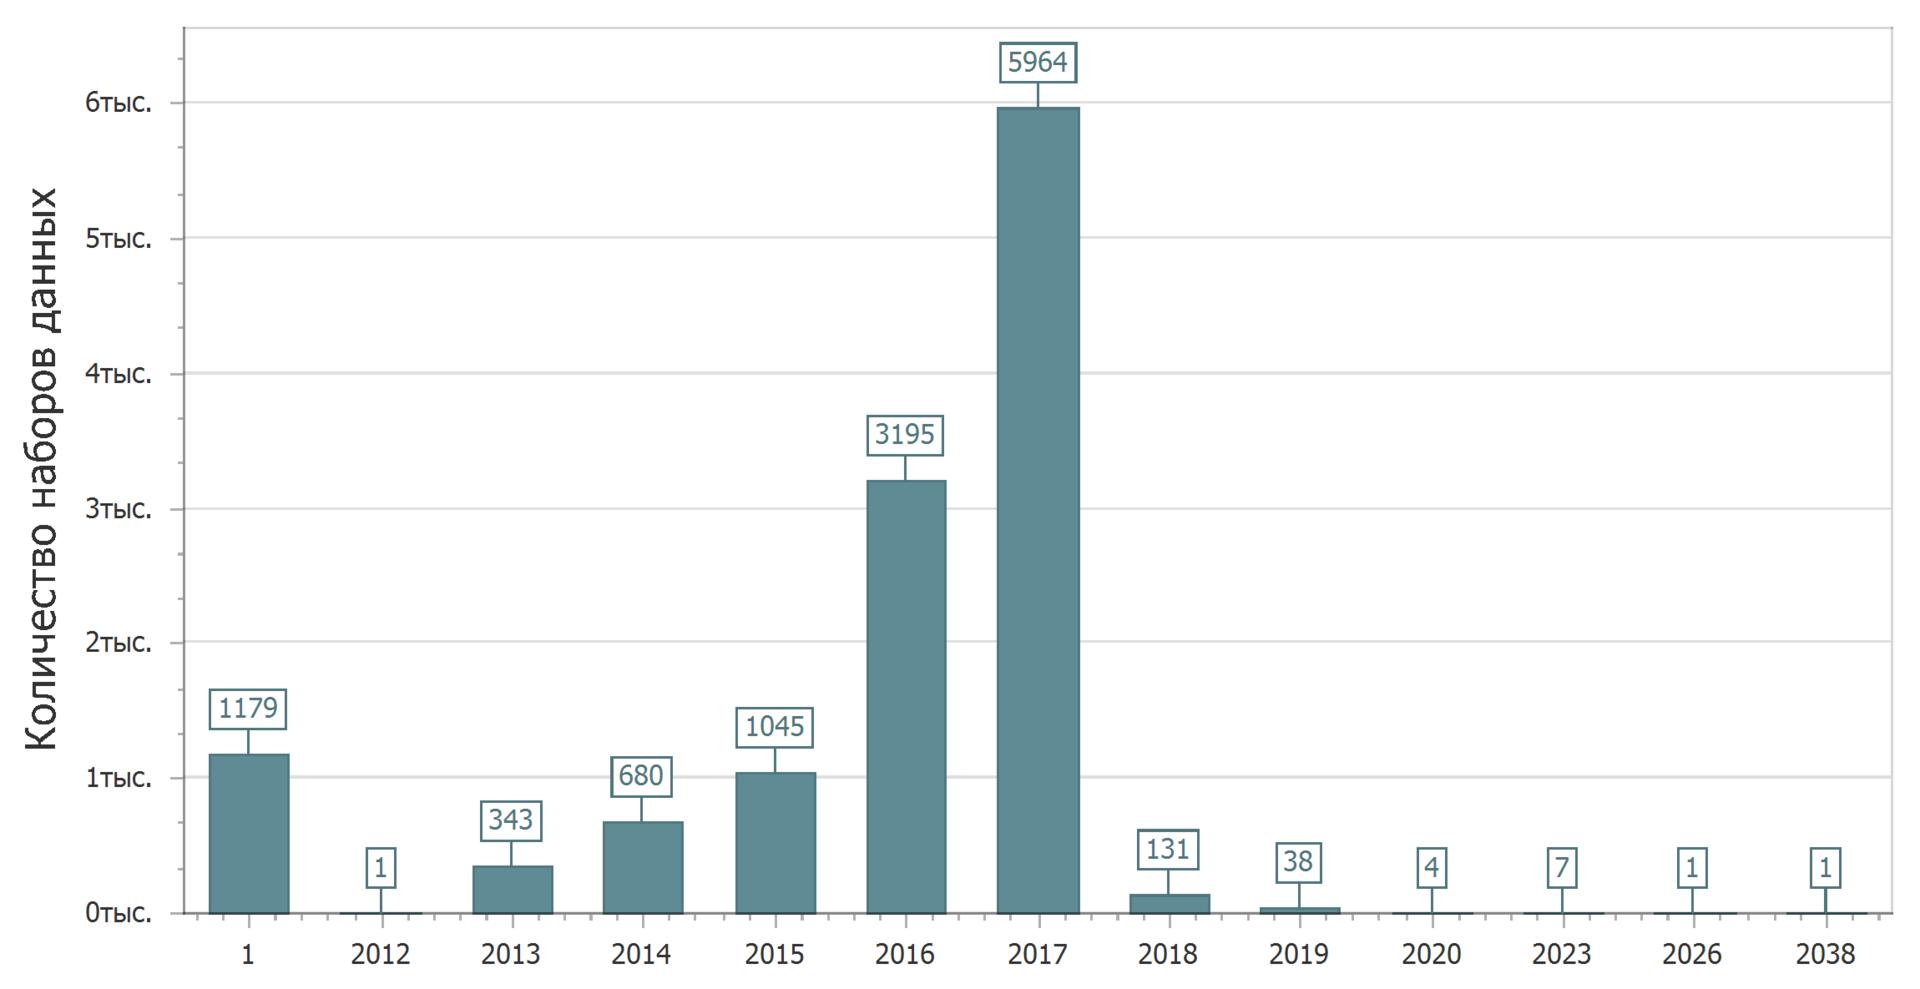 Анализ наборов данных с портала открытых данных data.gov.ru - 3